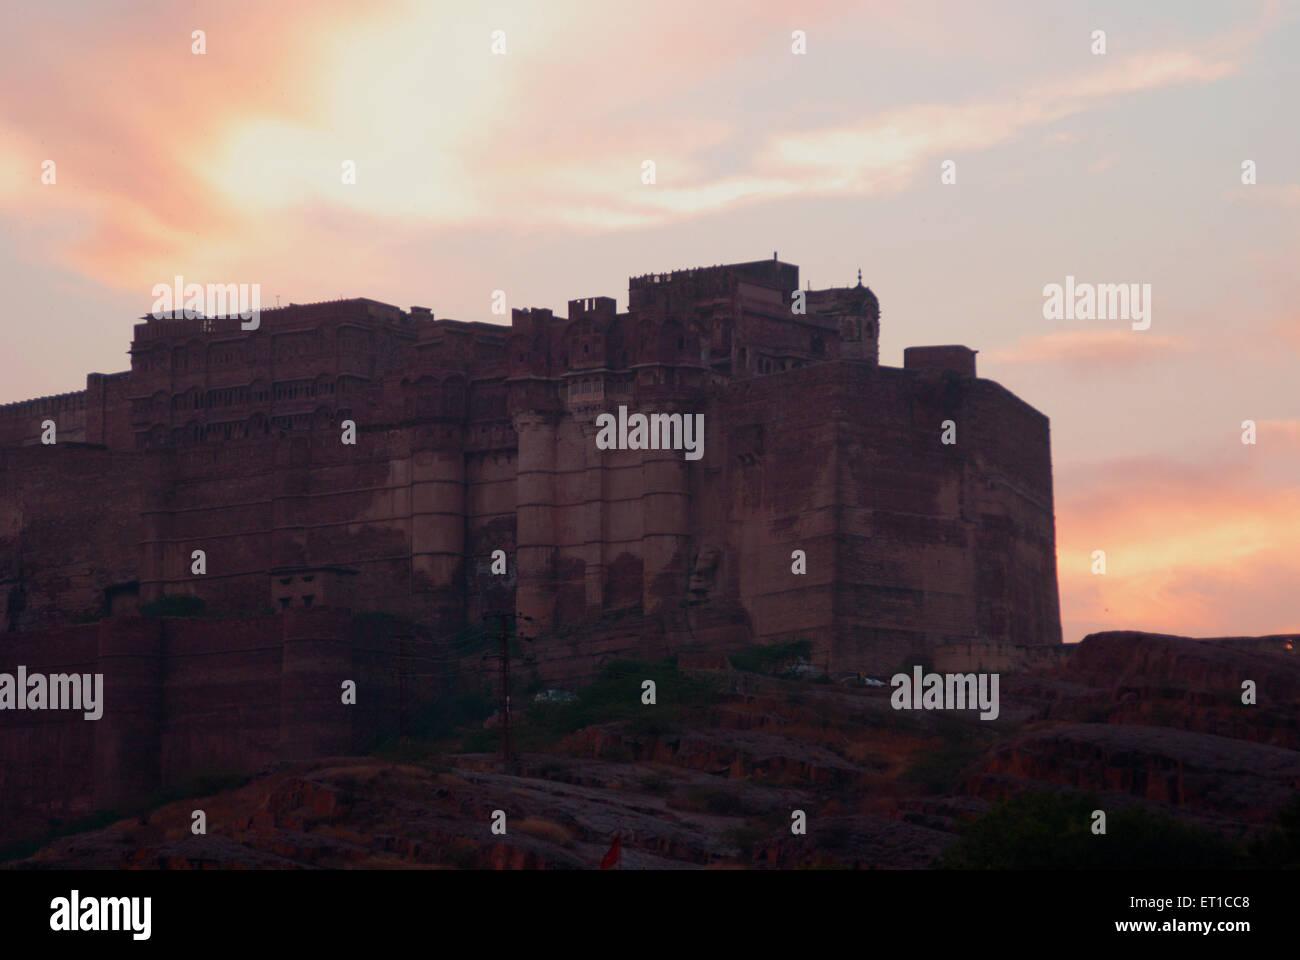 Mehrangarh Fort Jodhpur Rajasthan India Asia - Stock Image